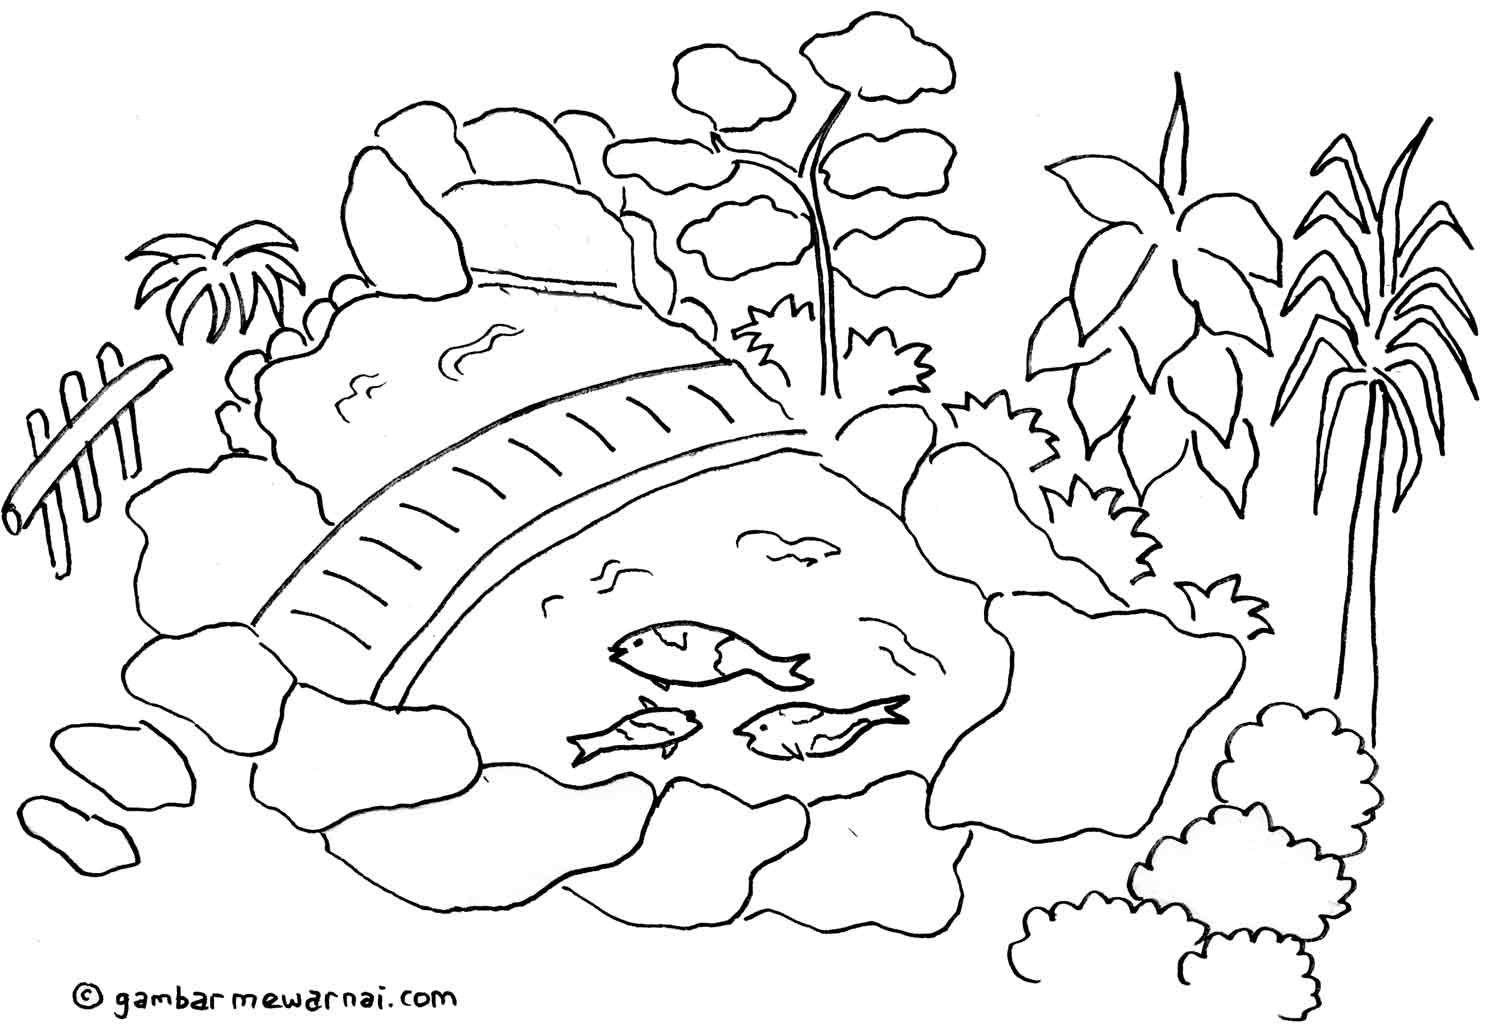 Gambar mewarnai kolam hias autism new definition pinterest park